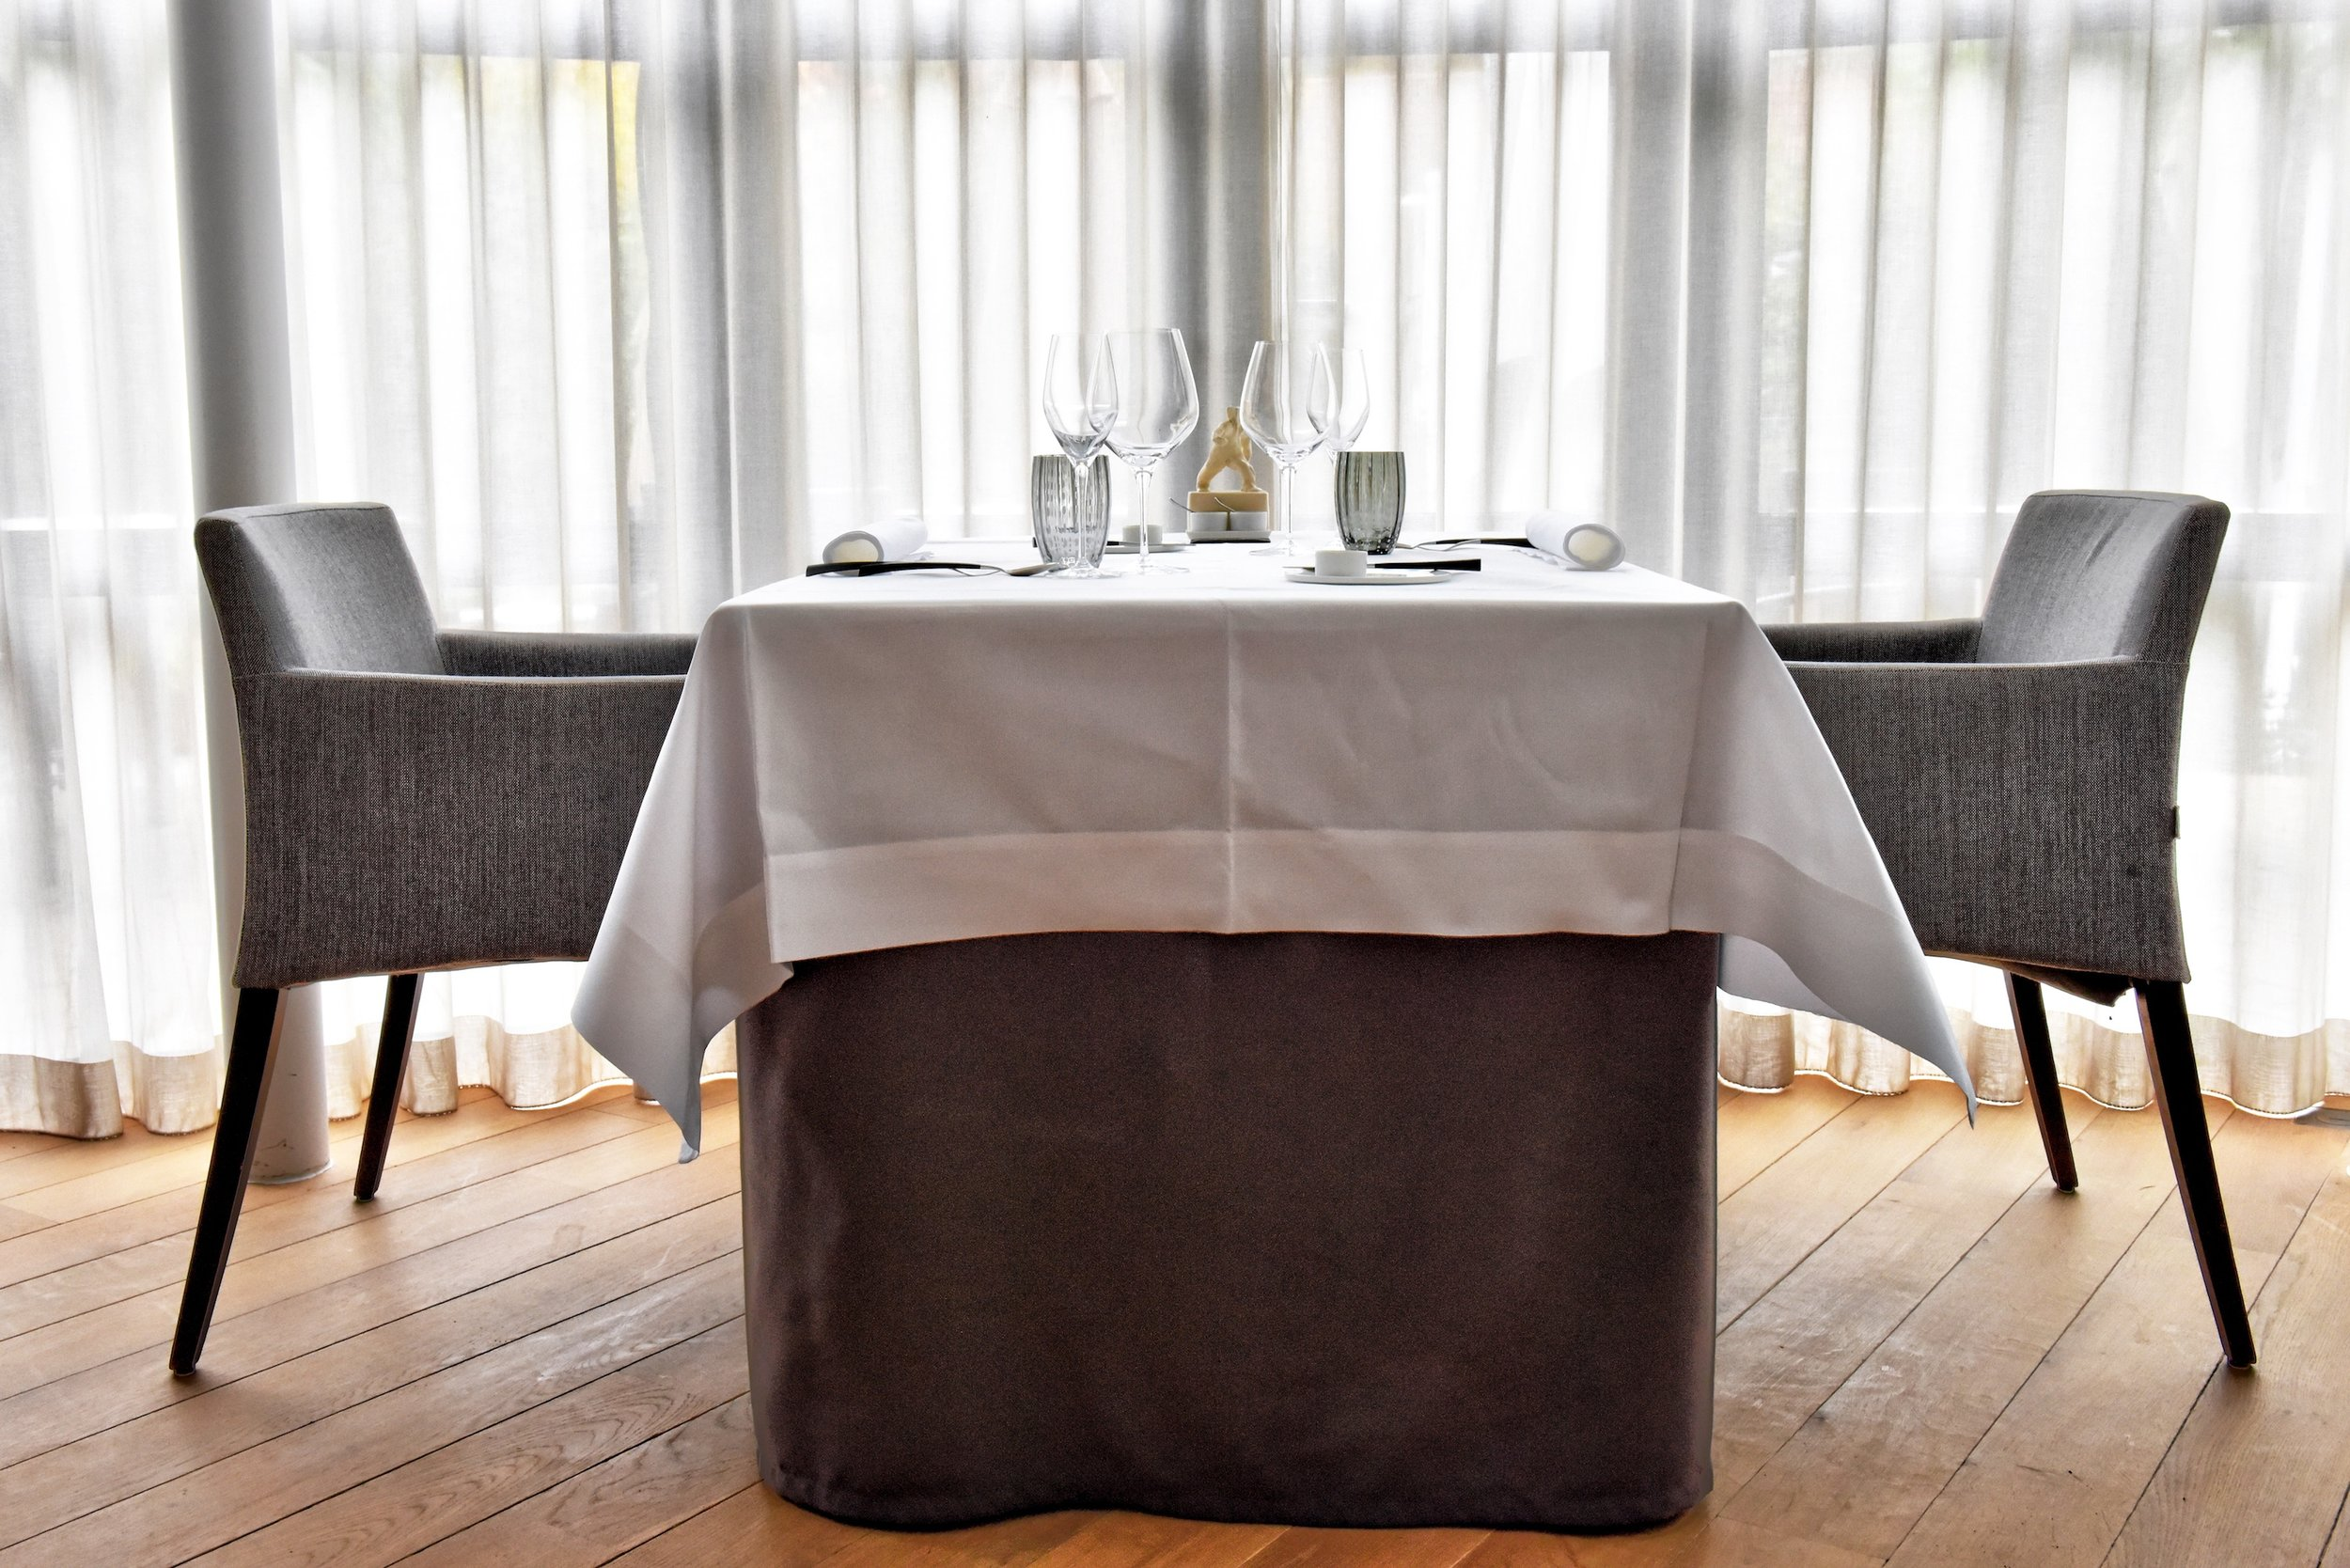 23 arenberg fotograaf restaurant michelin bart albrecht tablefever everlee Egenhoven 0001.jpg